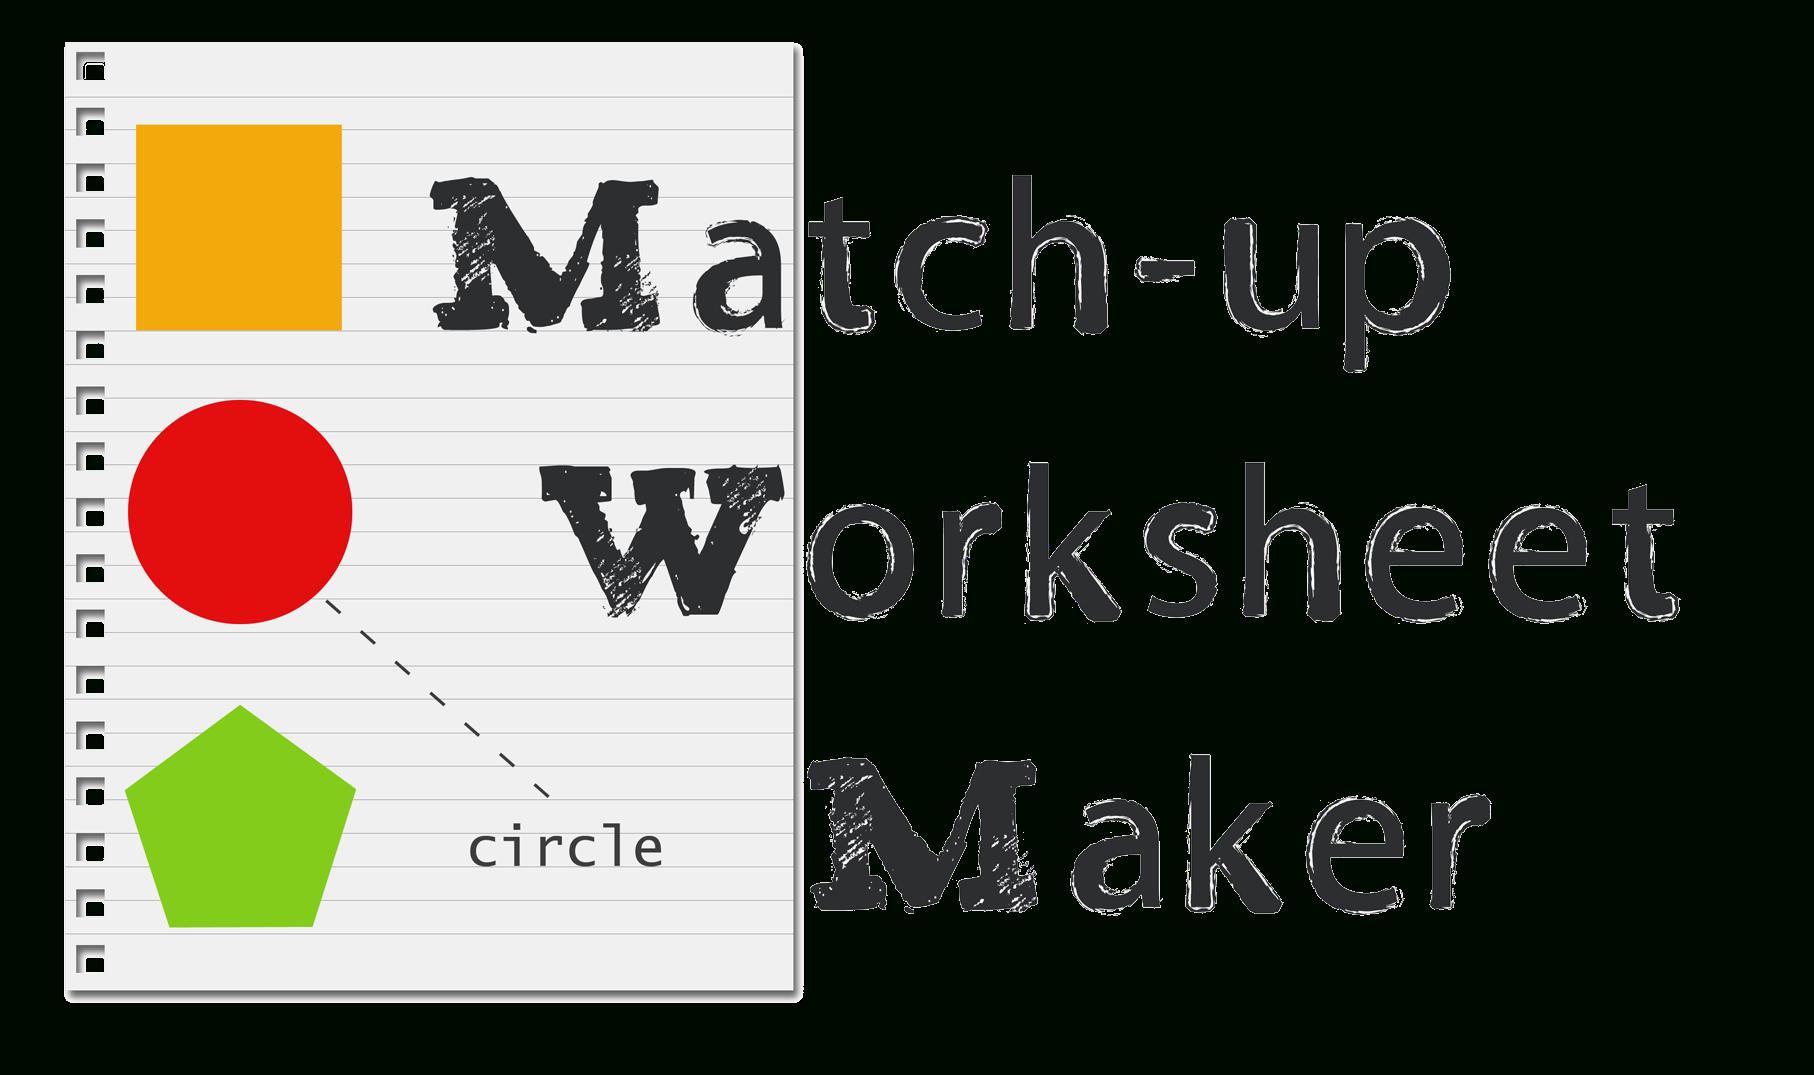 Matching Worksheet Maker: Create Custom Printable Worksheets | Printable Worksheet Maker